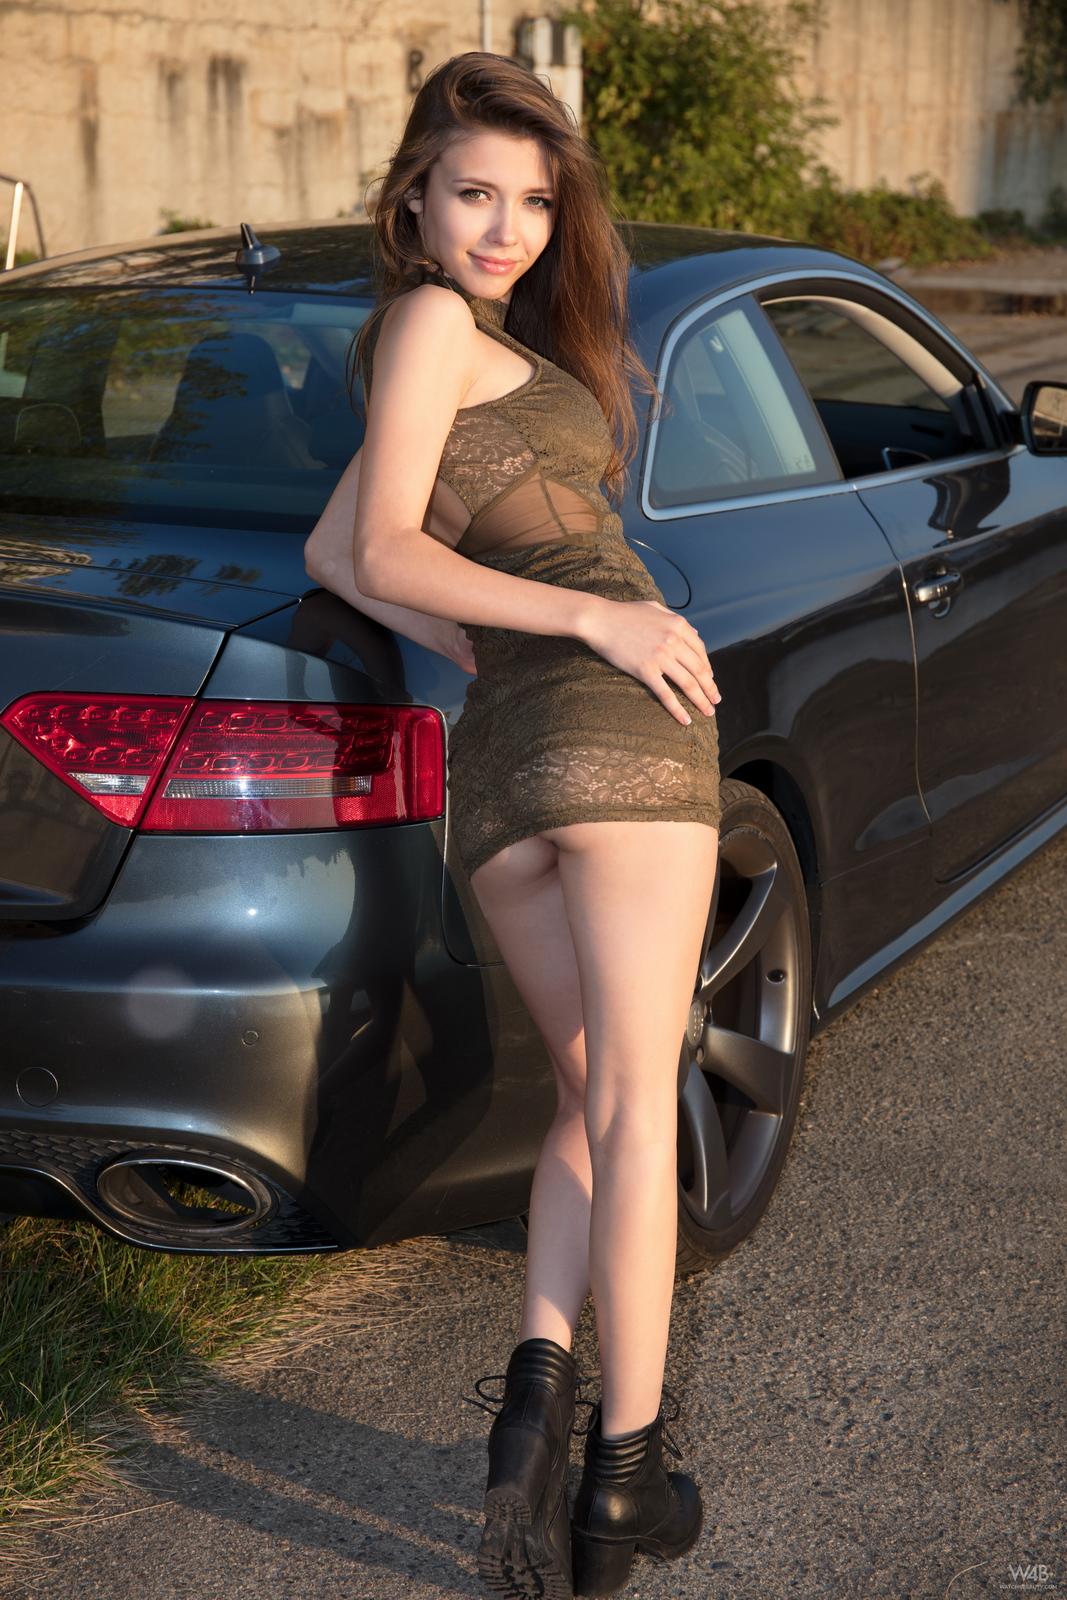 https://redbust.com/stuff/mila-azul-audi-rs5/milla-nude-audi-rs5-cars-pussy-watch4beauty-02.jpg